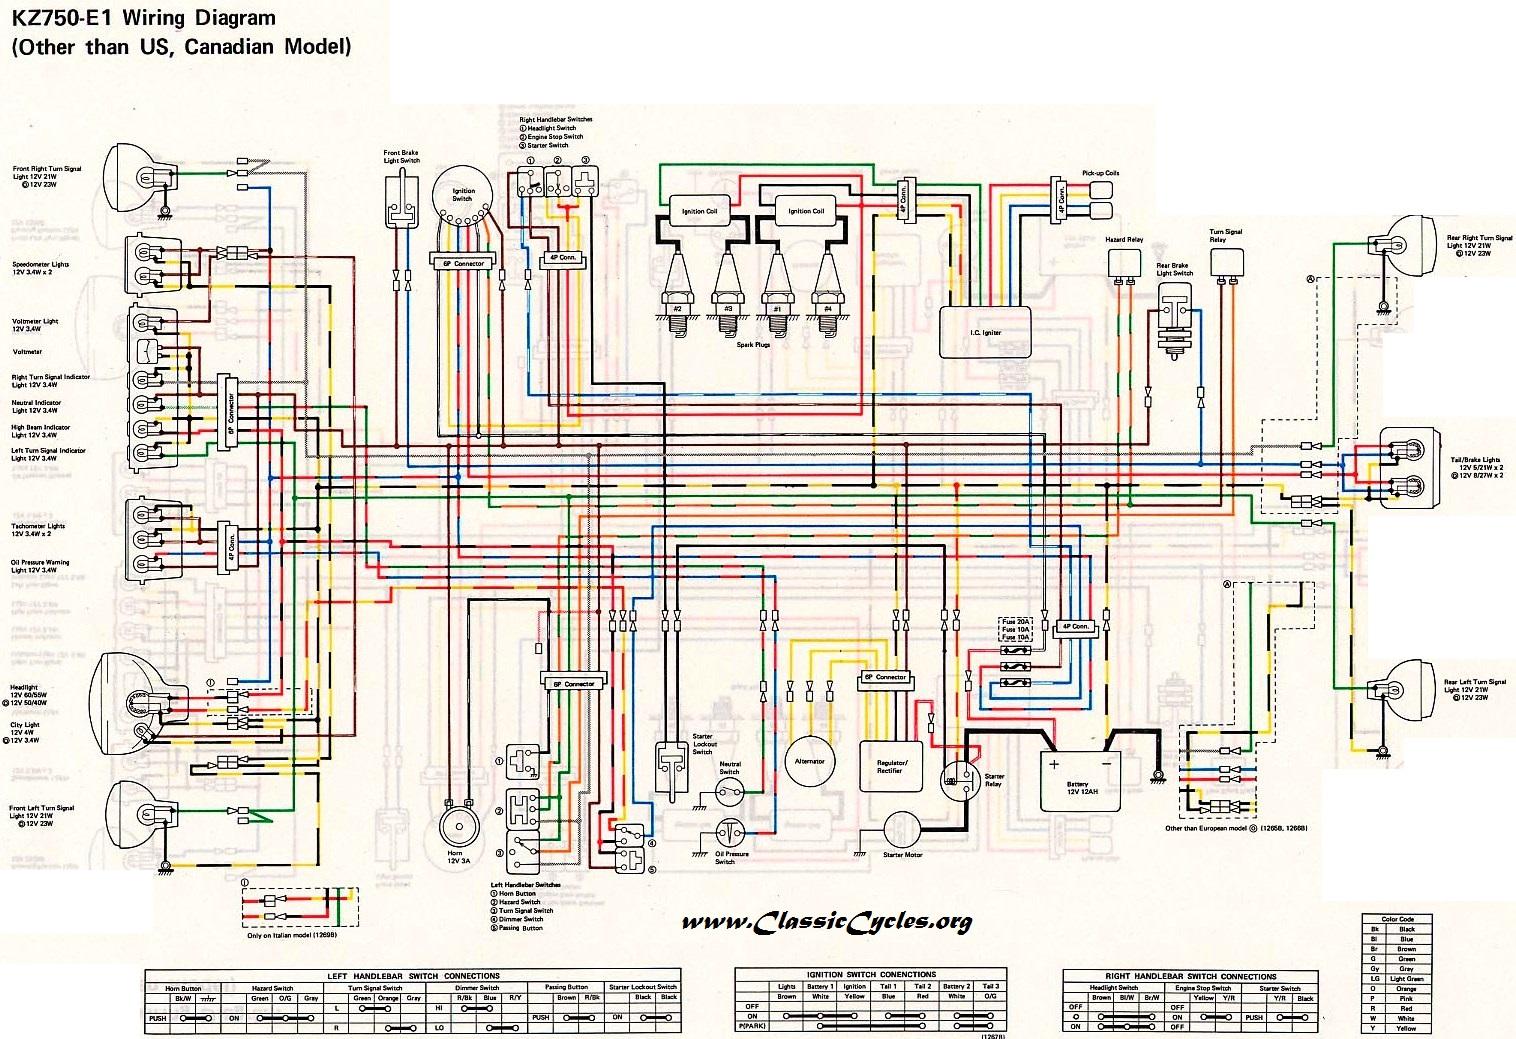 40841264b60c8a9fffff84f7ffffe41e?resize\=665%2C456 2008 klr 650 wiring diagram wiring diagram simonand 2007 klr 650 wiring diagram at gsmx.co